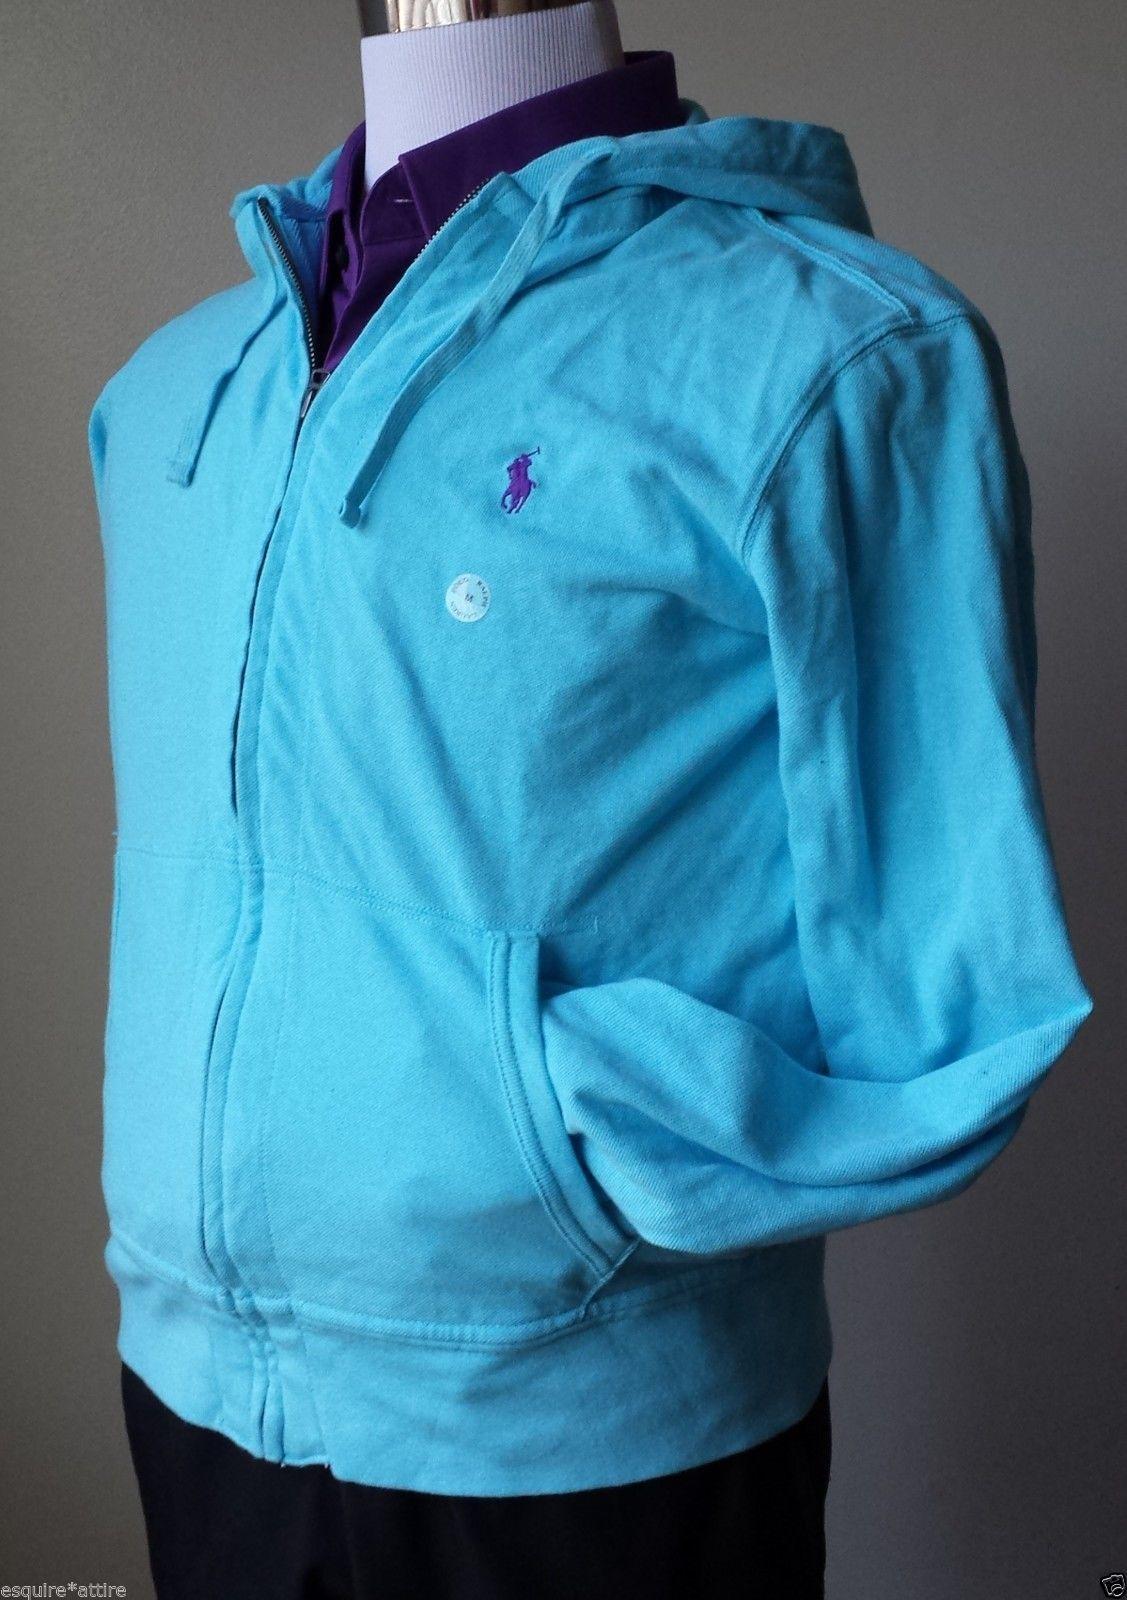 #POLO Ralph Lauren men size M full size zip blue hoodie NWT light cotton RalphLauren visit our ebay store at  http://stores.ebay.com/esquirestore